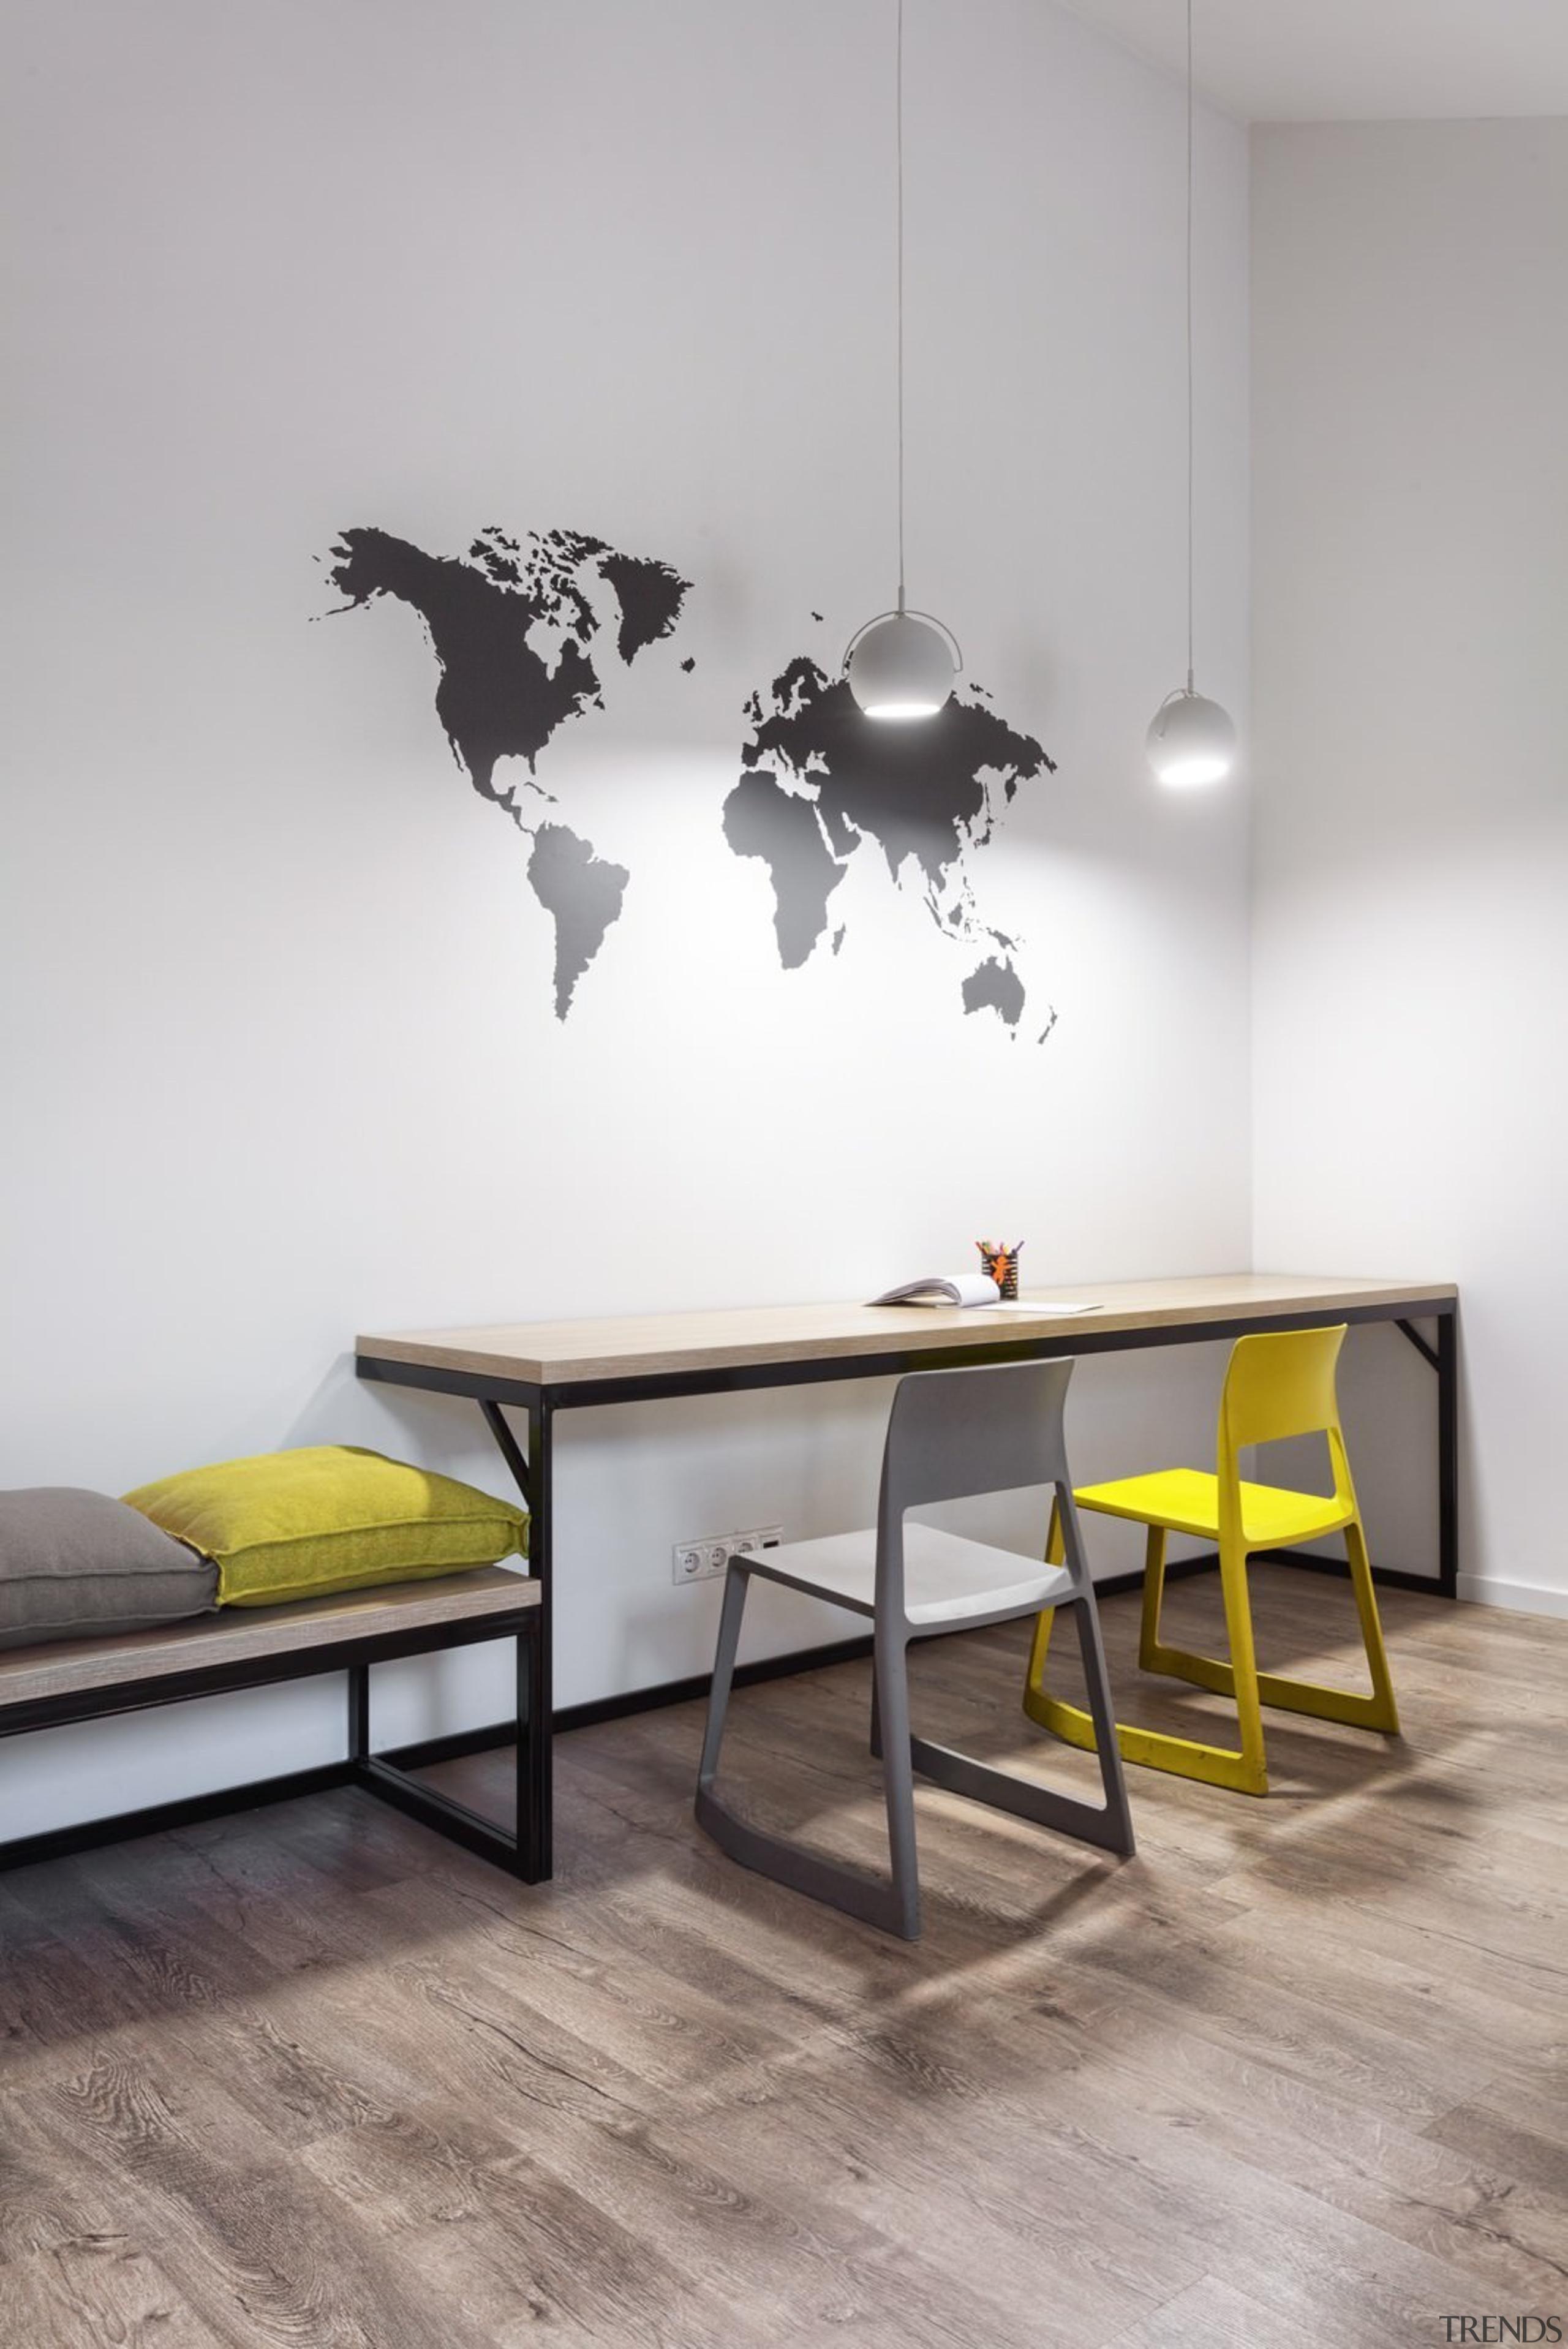 Architect: Martin ArchitectsPhotography by Alexander Kondrianenko floor, flooring, furniture, interior design, product design, table, wall, gray